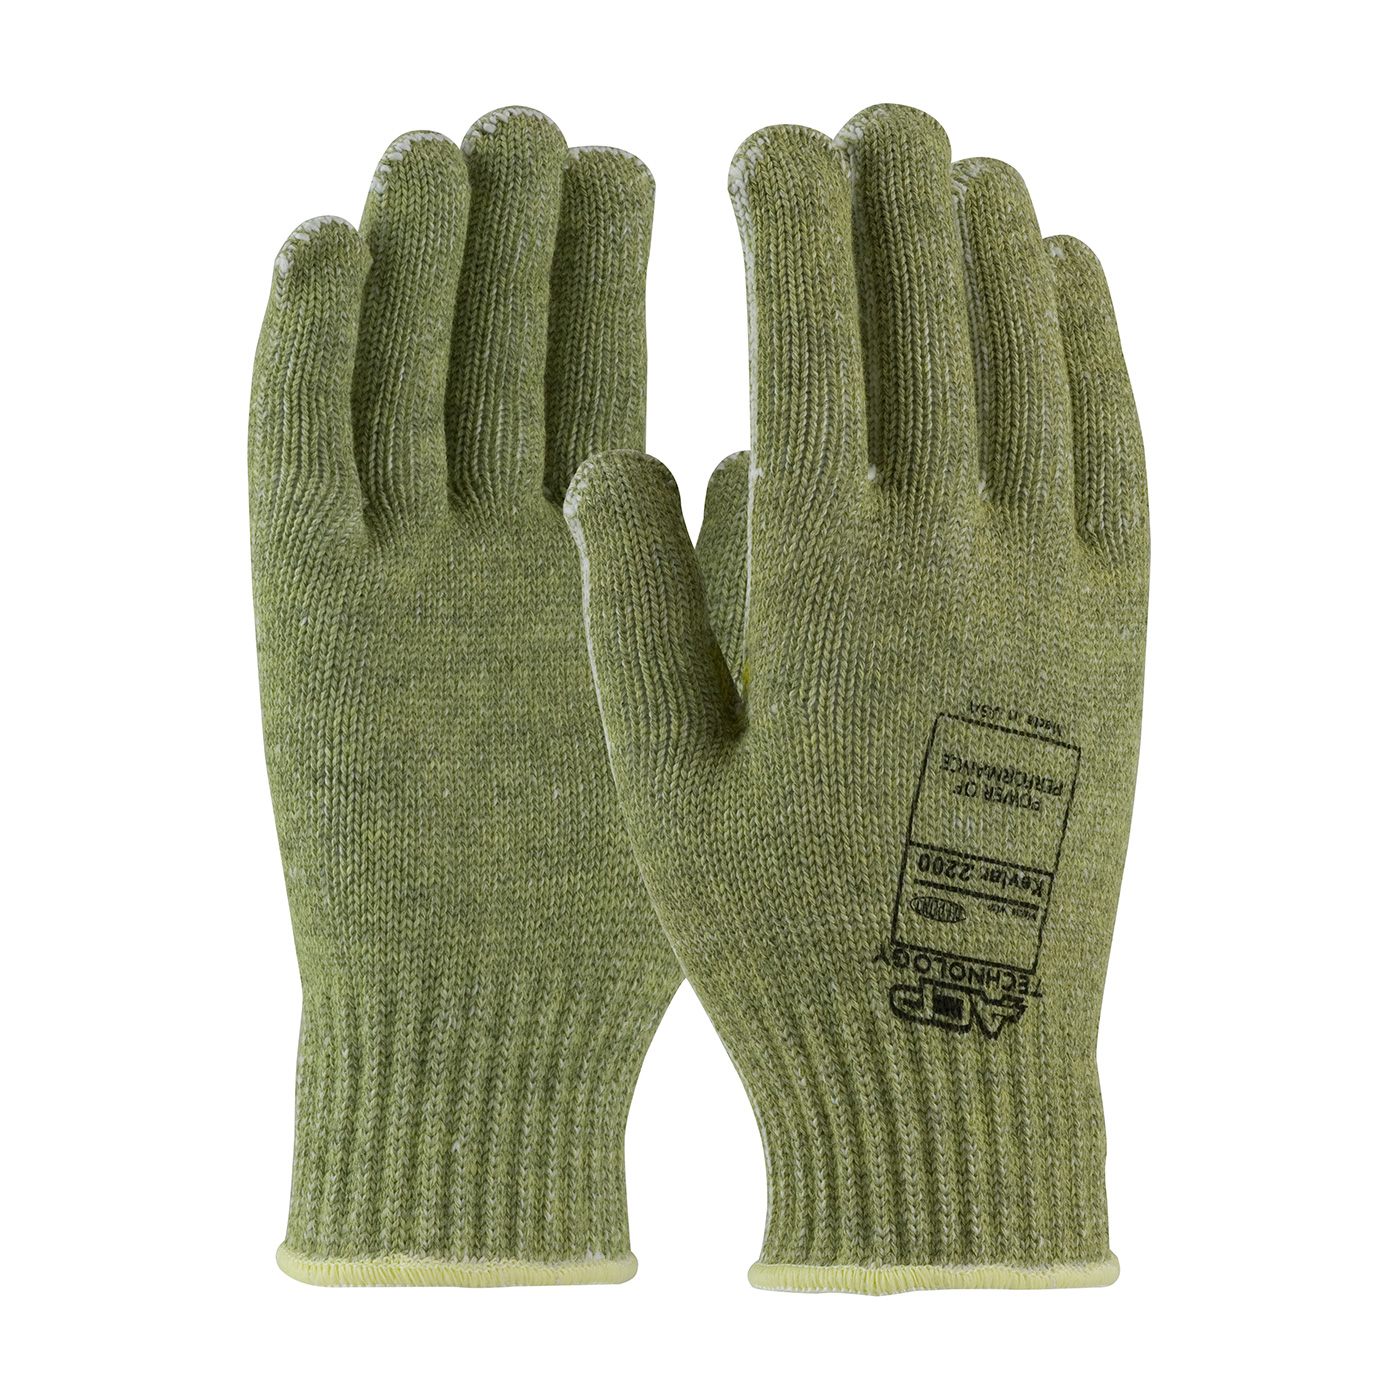 PIP® Kut-Gard® 07-KA744/L Economy Weight Cut Resistant Gloves, L, ACP/Kevlar®, Elastic/Knit Wrist Cuff, Resists: Abrasion, Cut and Heat, ANSI Cut-Resistance Level: A3